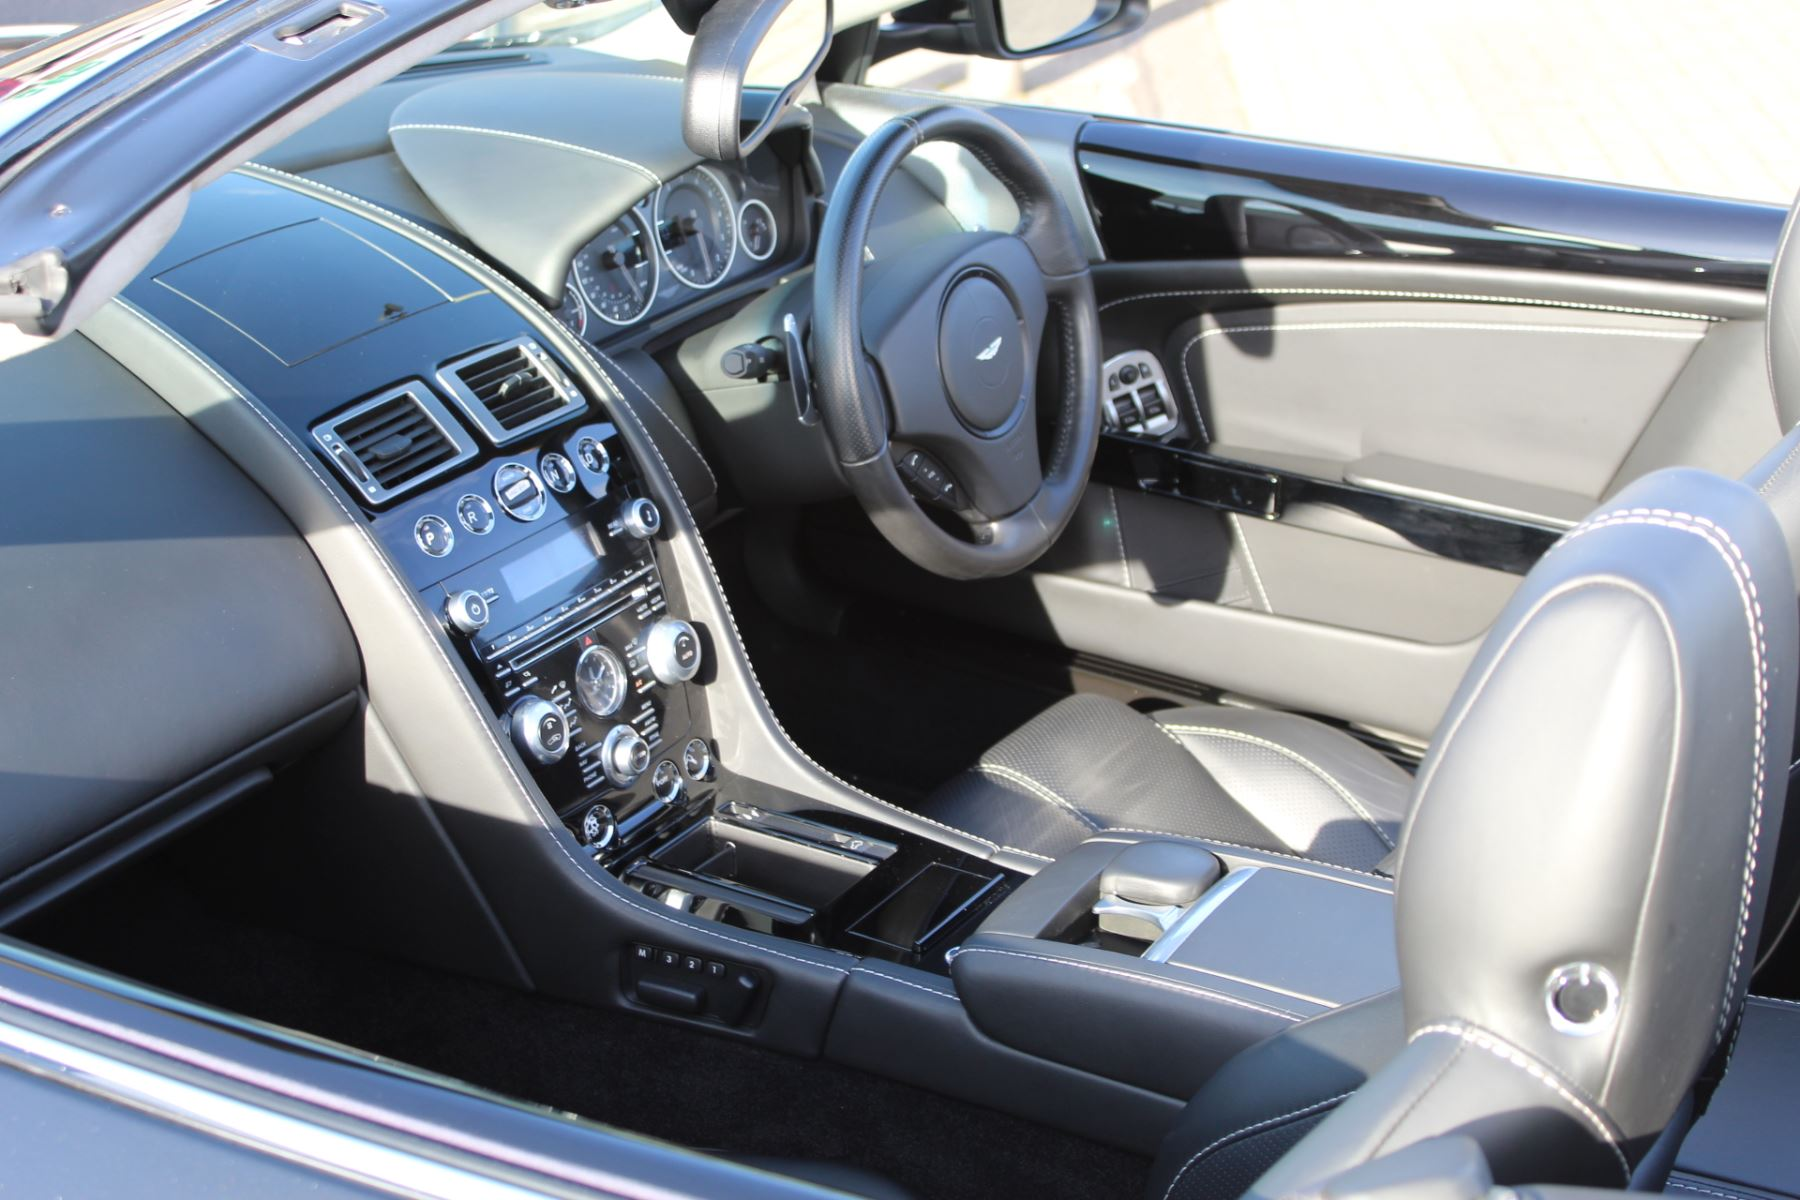 Aston Martin DB9 V12 2dr Volante Touchtronic [470] image 12